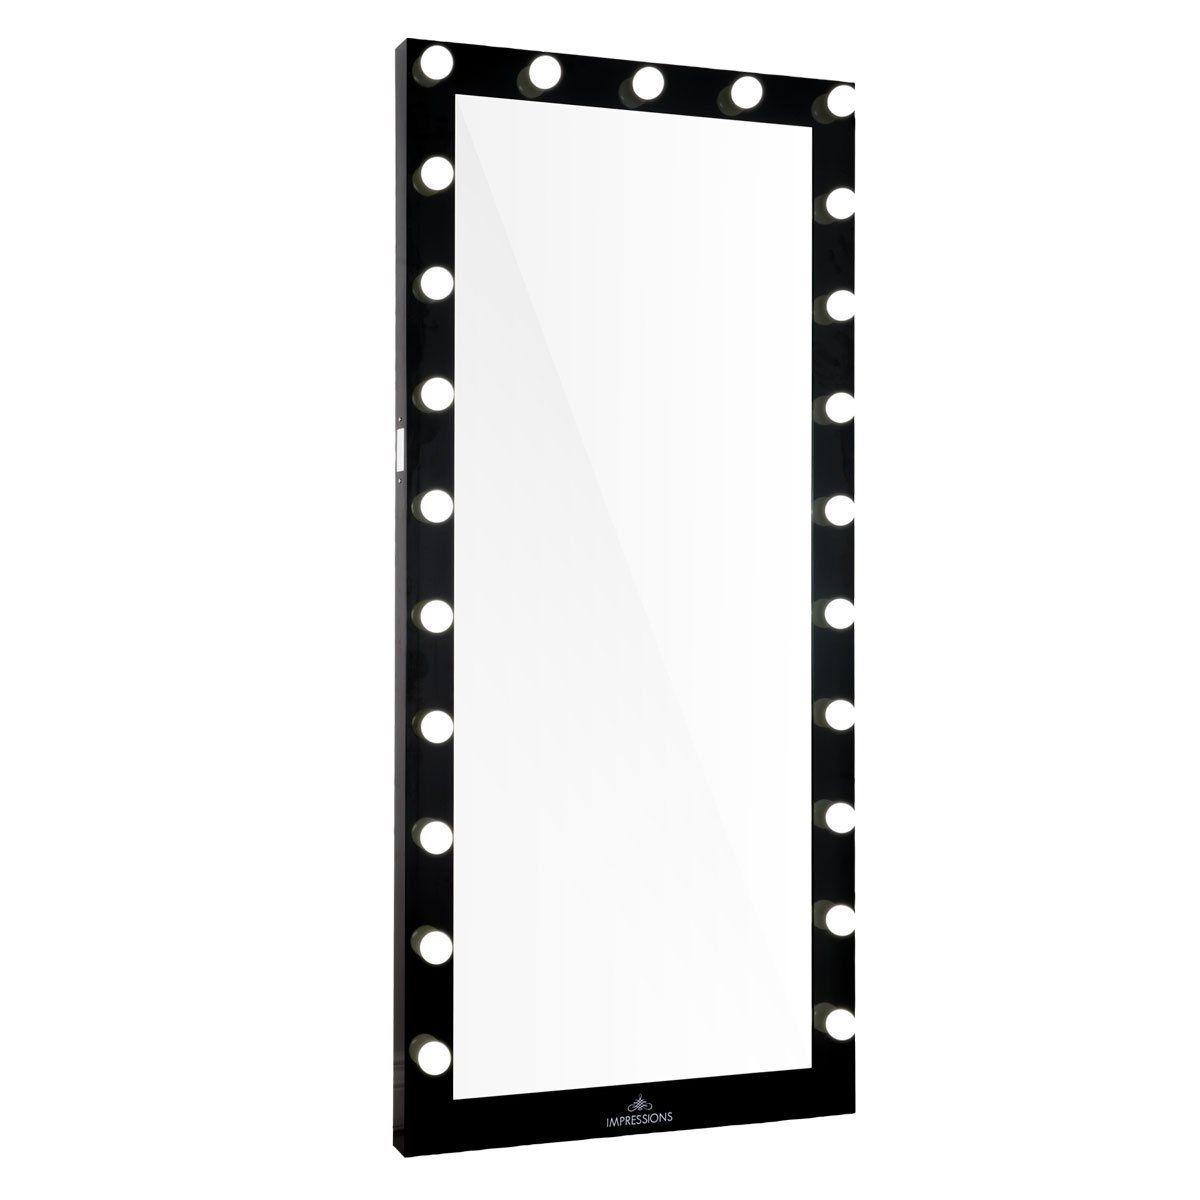 Hollywood Iconic Full Length Vanity Floor Mirror Hollywood Vanity Mirror Full Length Mirror With Lights Floor Mirror